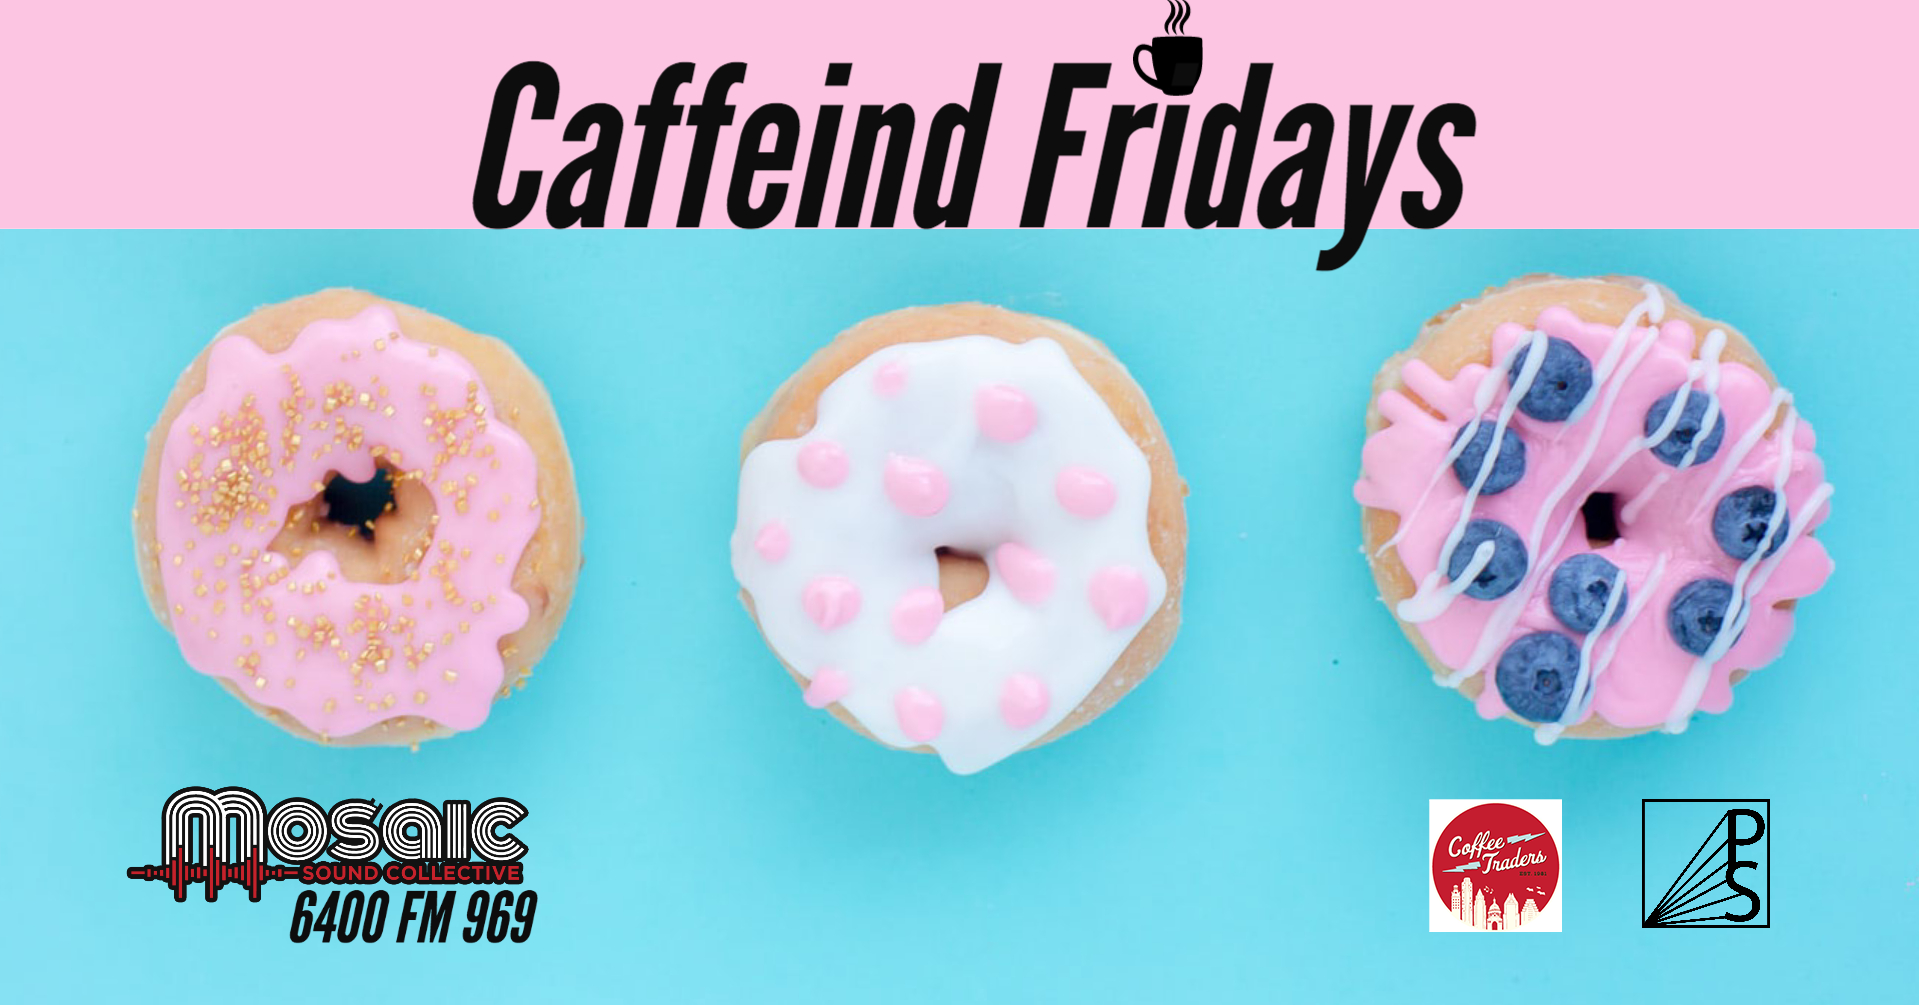 Caffeind Fridays